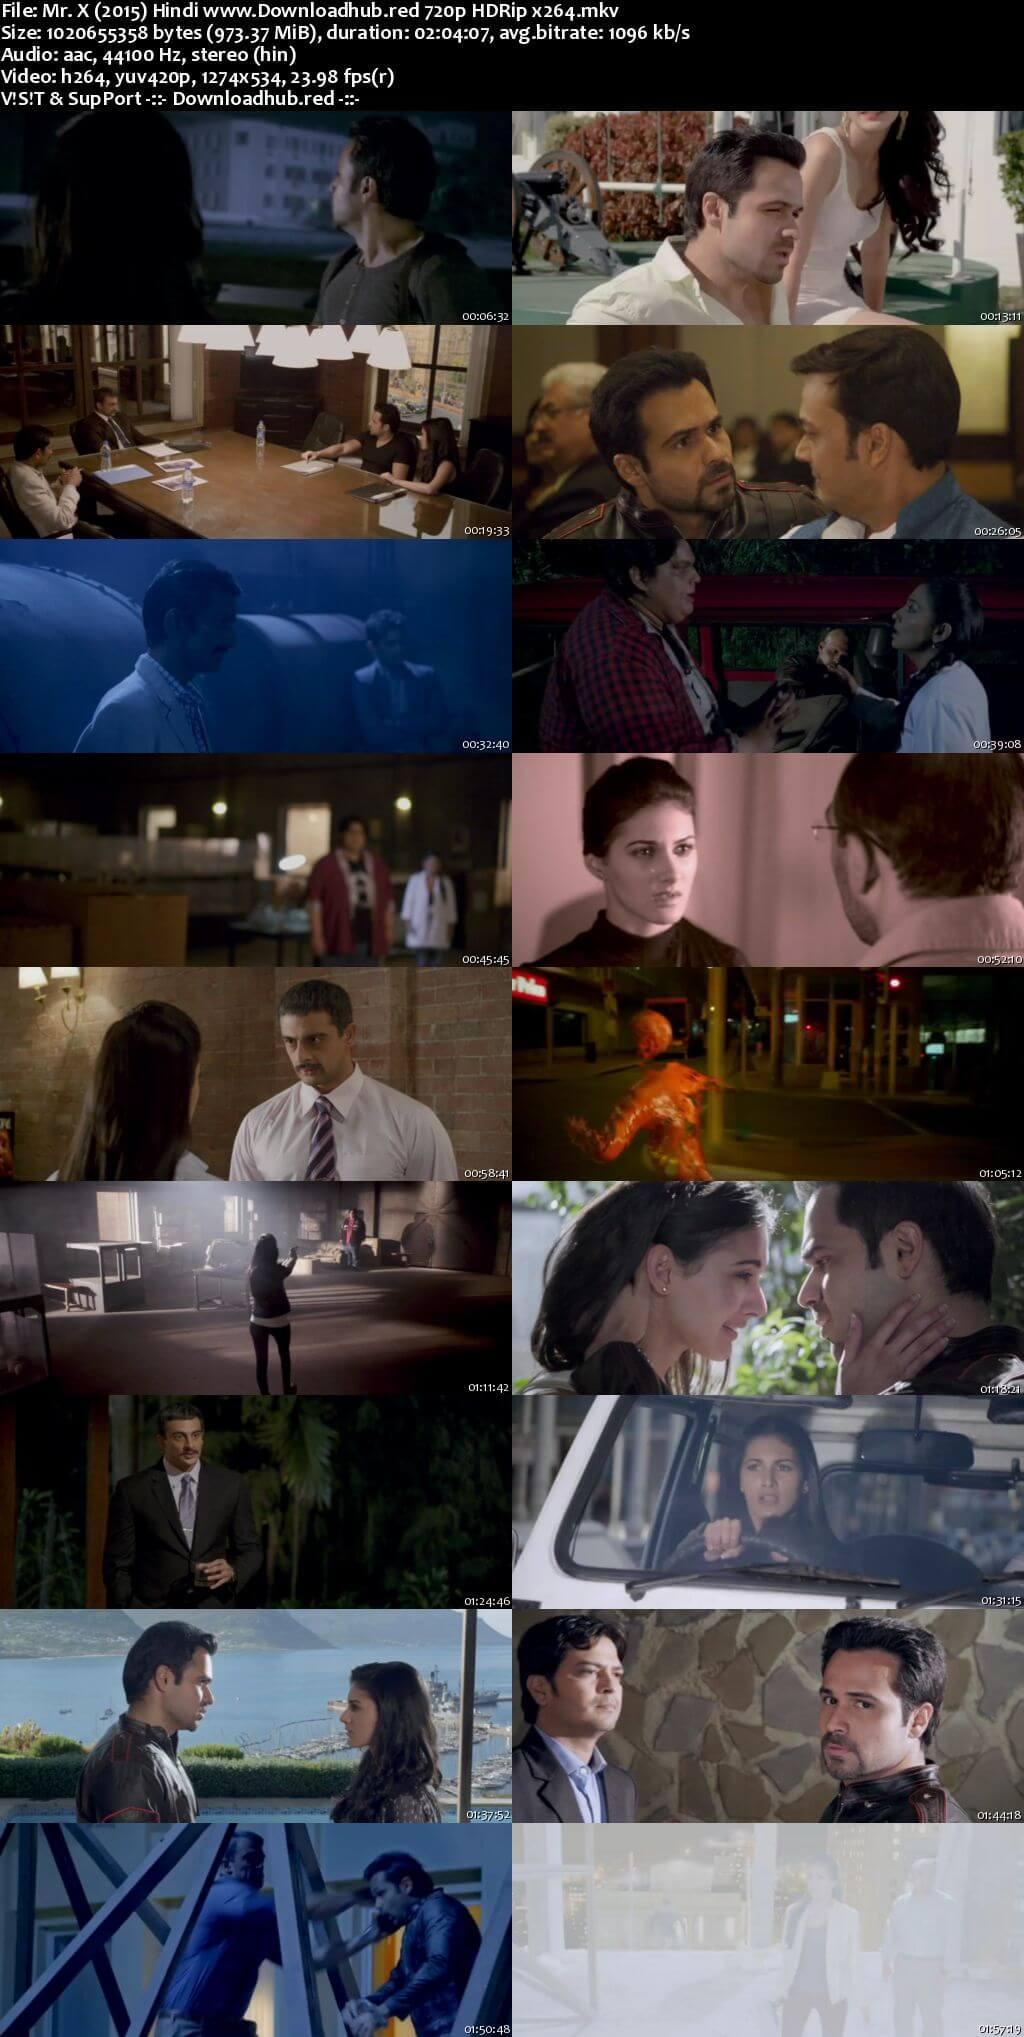 Mr. X 2015 Hindi 720p HDRip x264